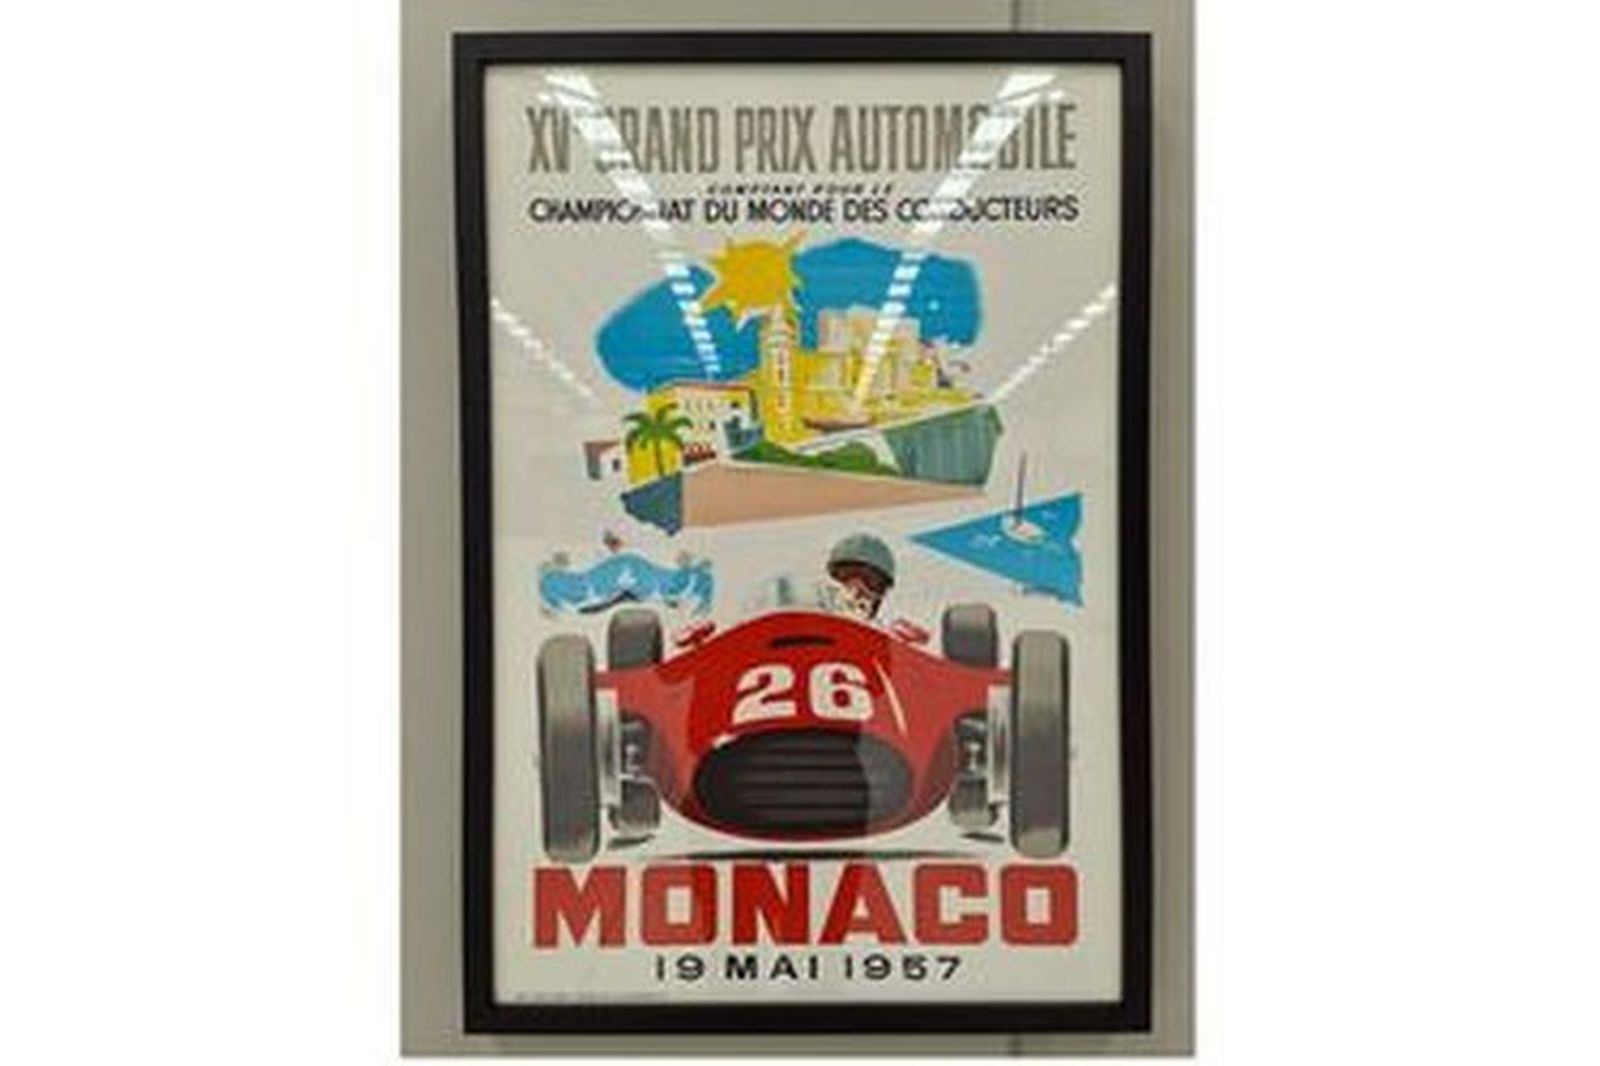 XV Grand Prix Automobile Framed Print